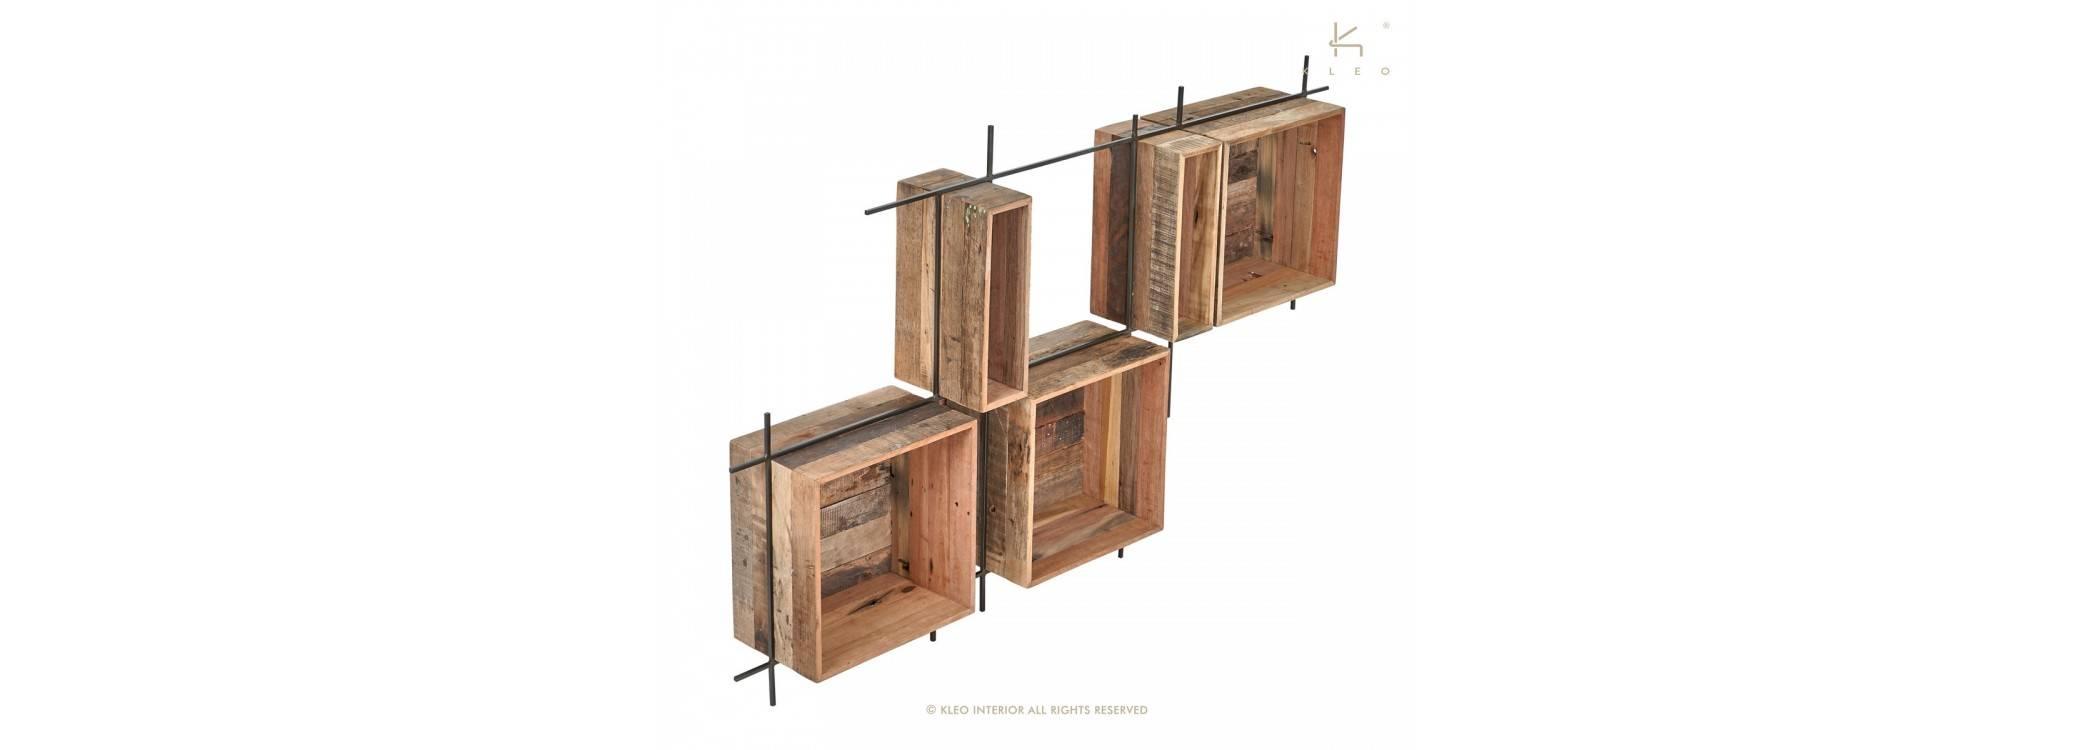 Wall-mounted horizontal decorative shelves